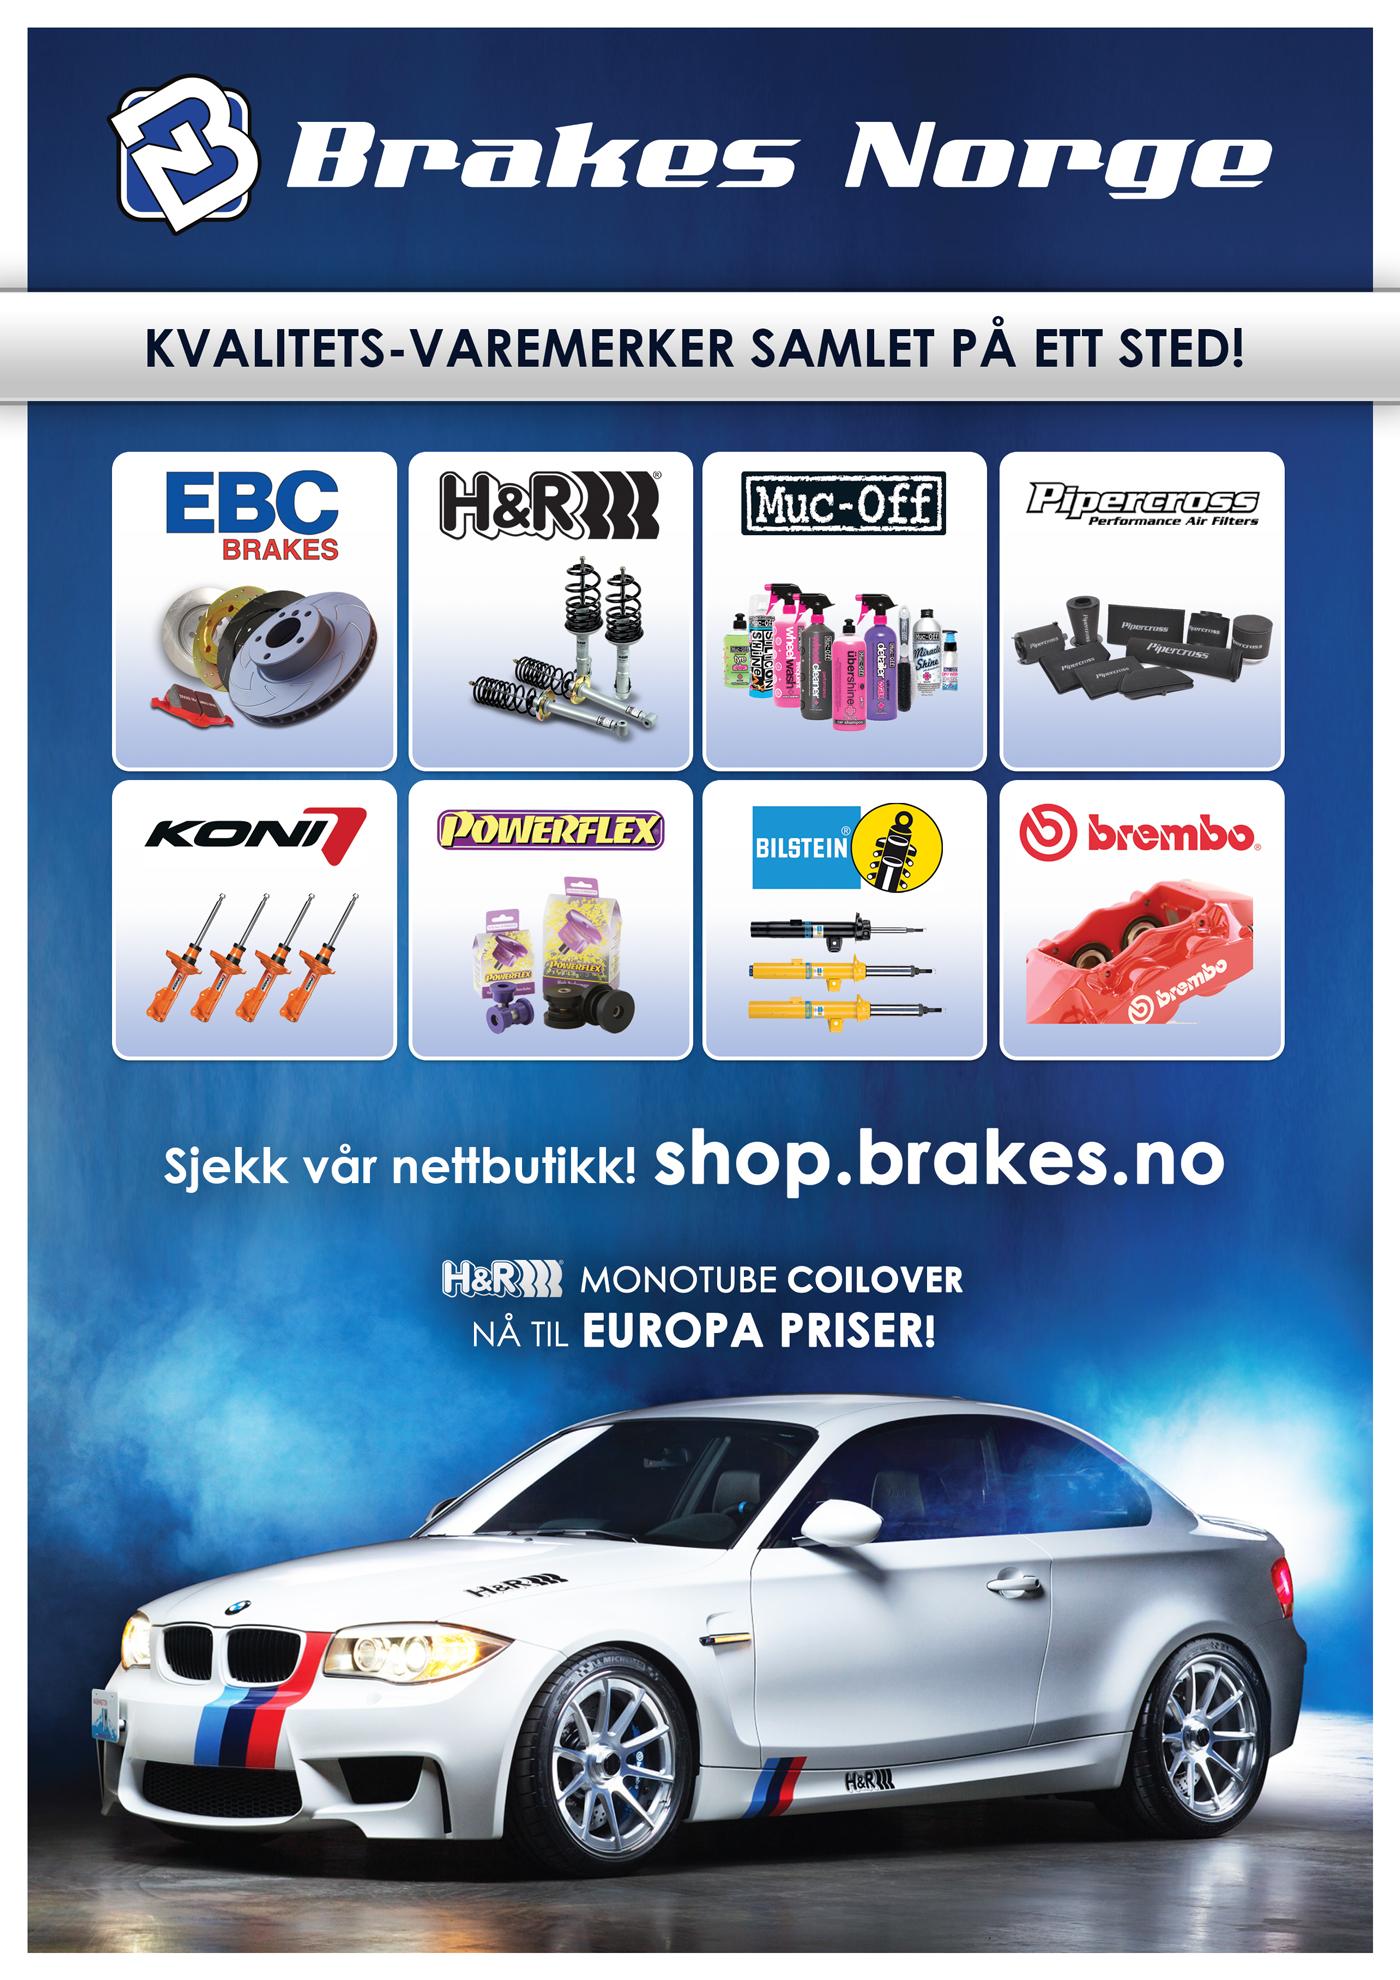 EBC Brakes, H&R, Muc-Off, Pipercross, Koni, Powerflex, Bilstein, Brembo, Brakes Norge, varemerker